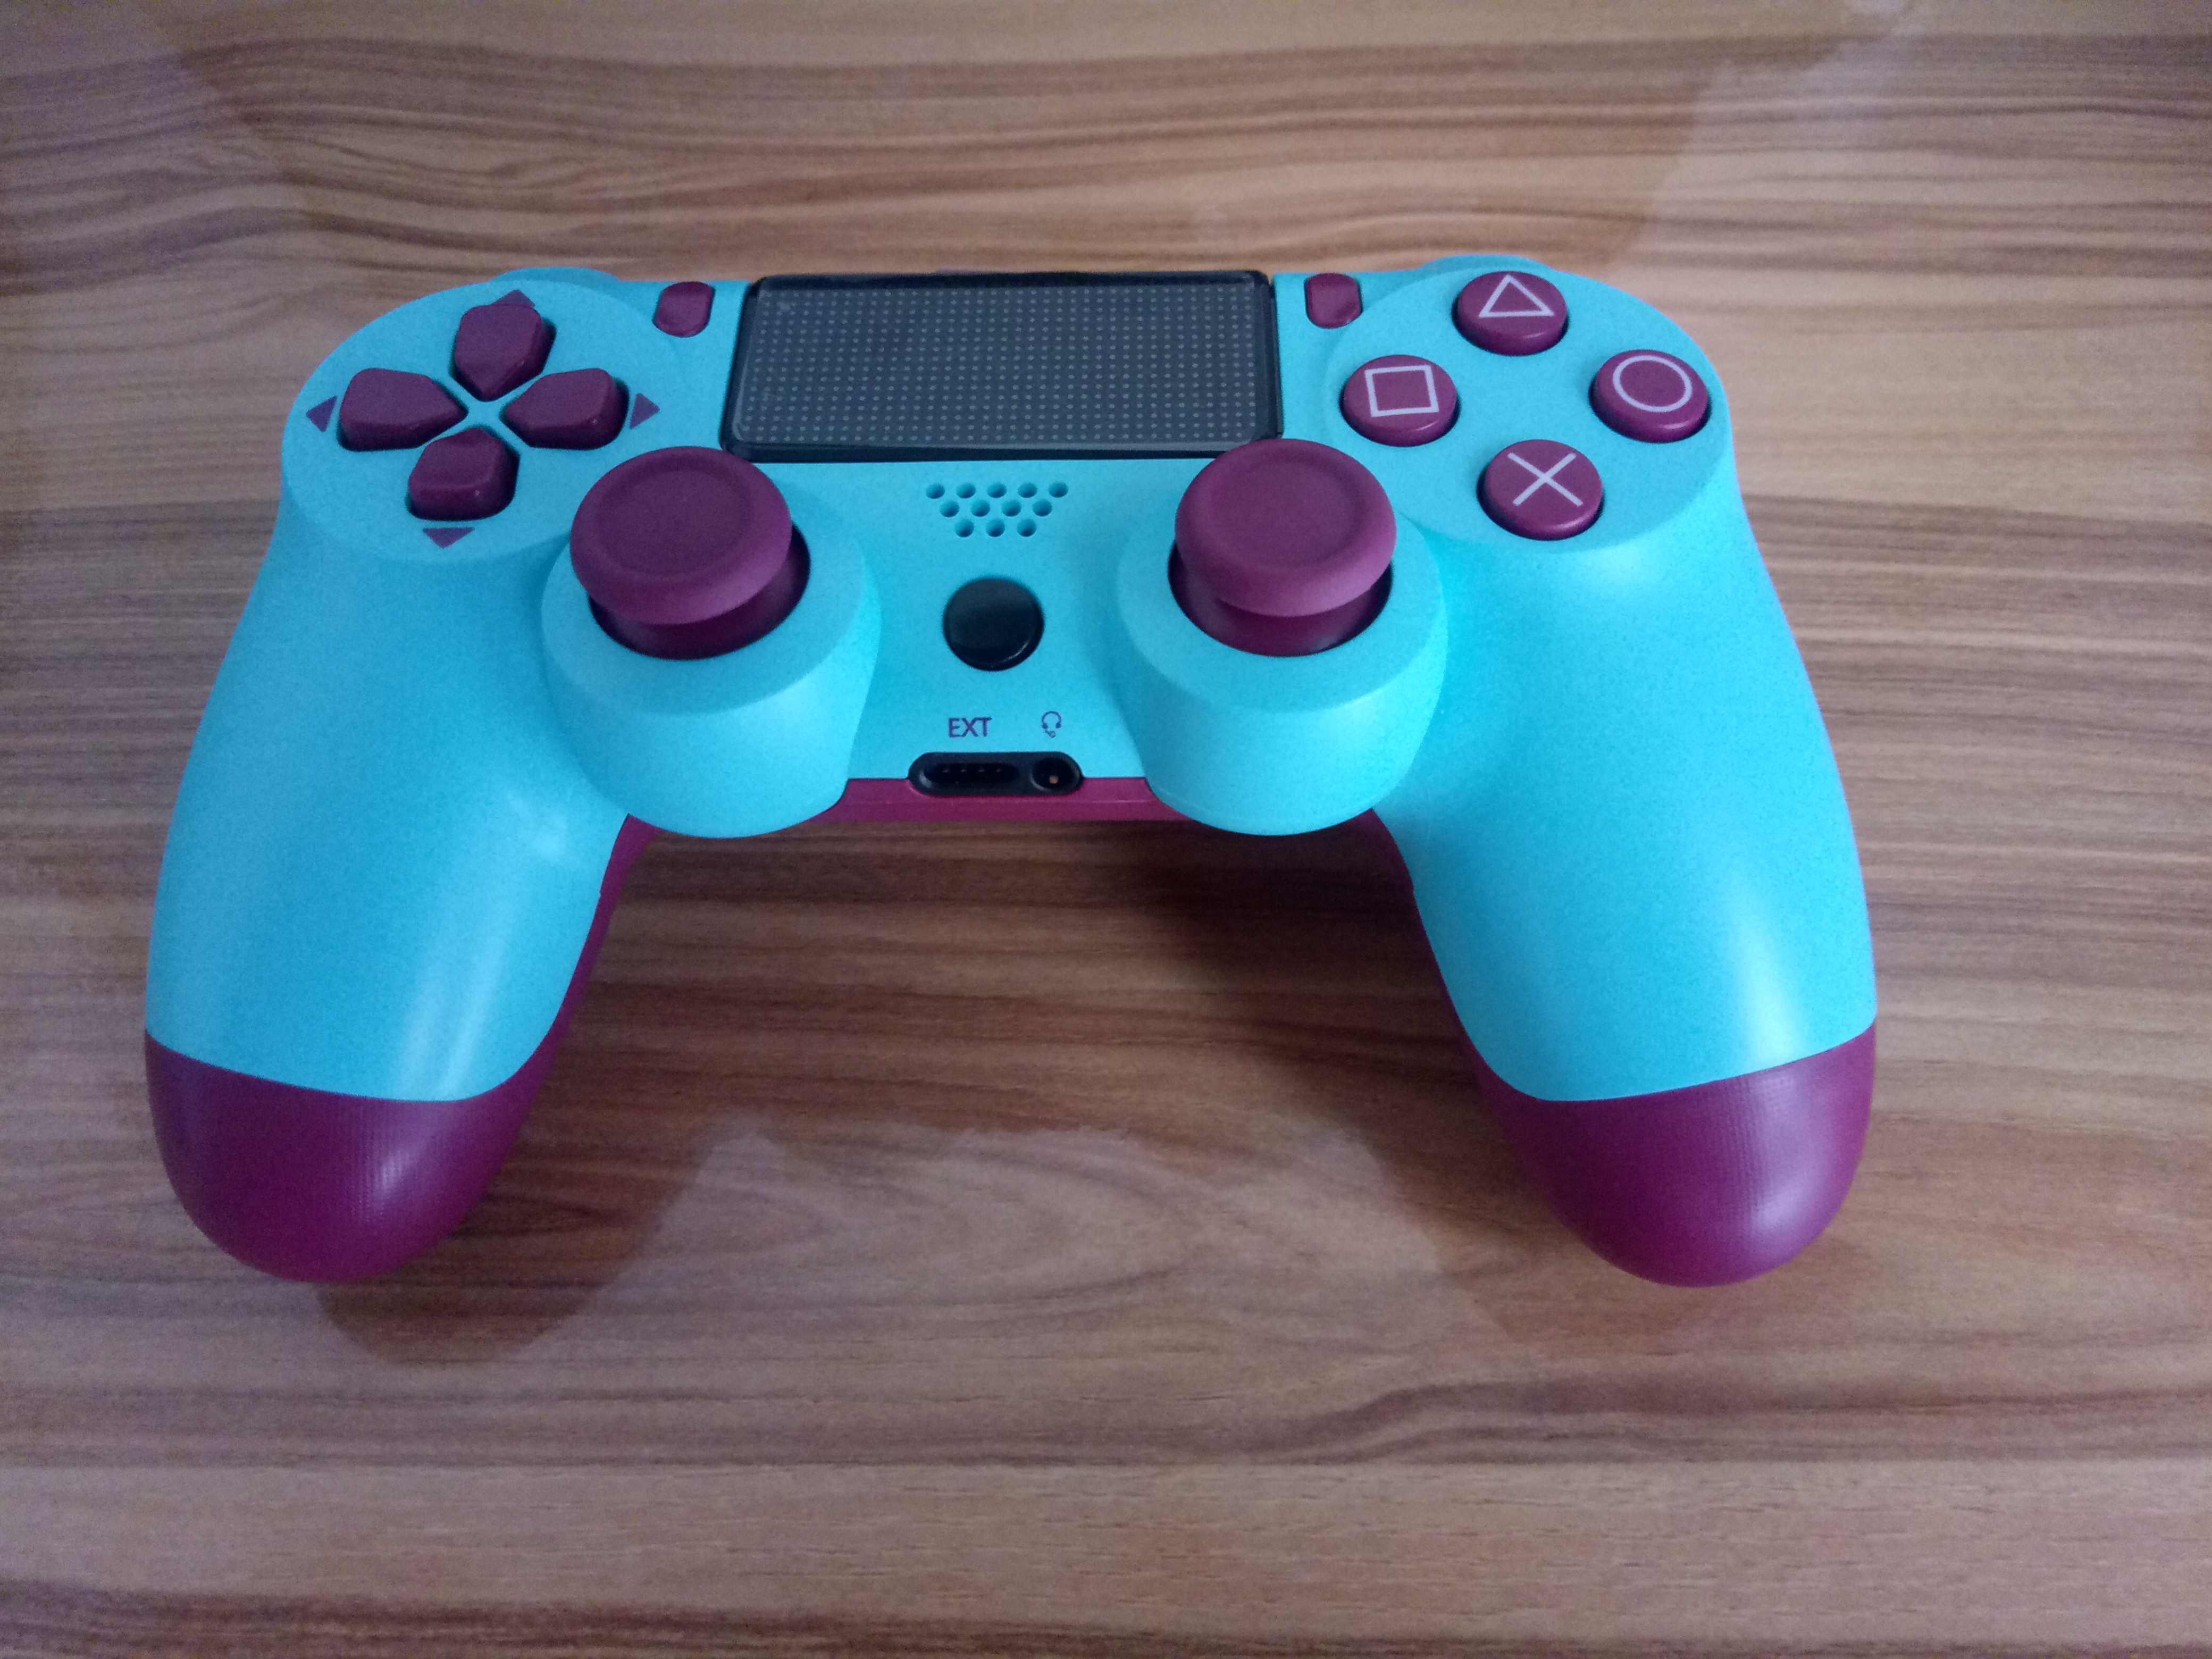 Bluetooth Controller Gamepad PS4 Controle PS4 Mando PS4 Wireless Controller Comando PS4 Kontrol PS4 PS4 Joystick PS4 Gamepad